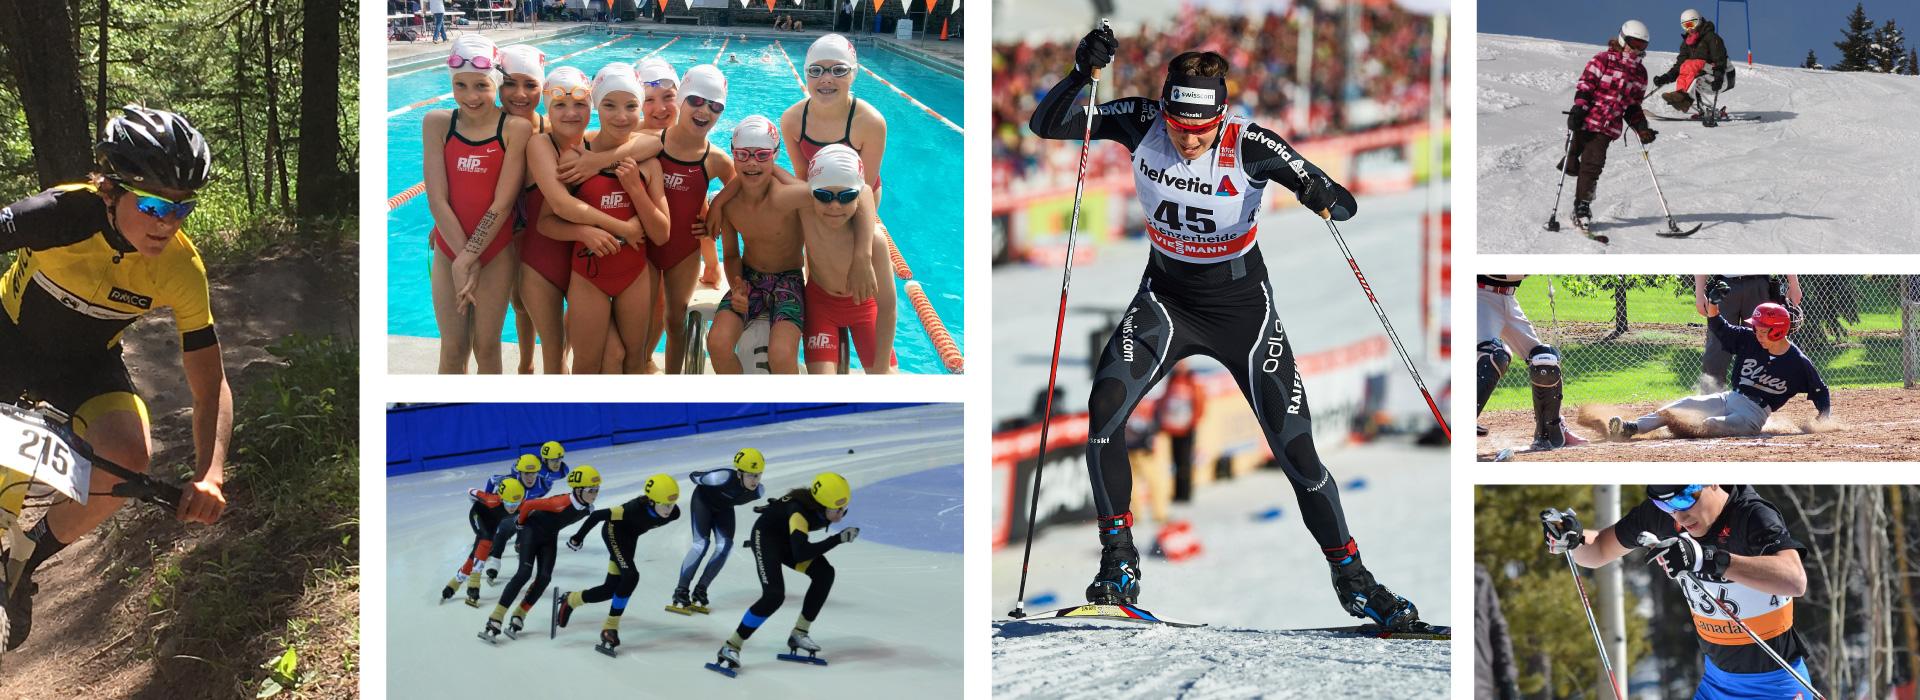 Youth Sport Fund